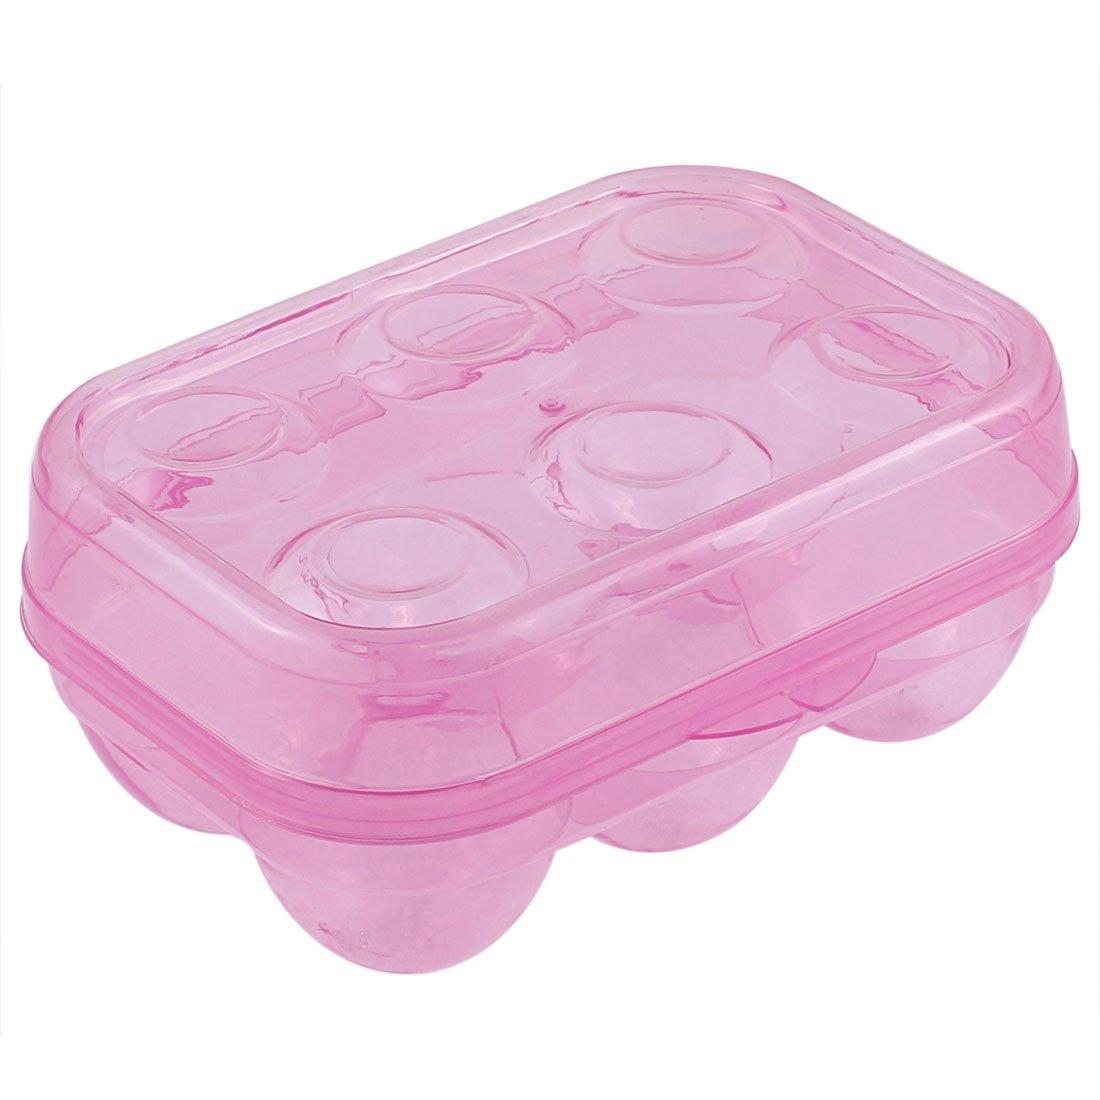 uxcell Plastic Picnic Camping Folding 6 Egg Holder Storage Box Clear Fushia a15100900ux0040